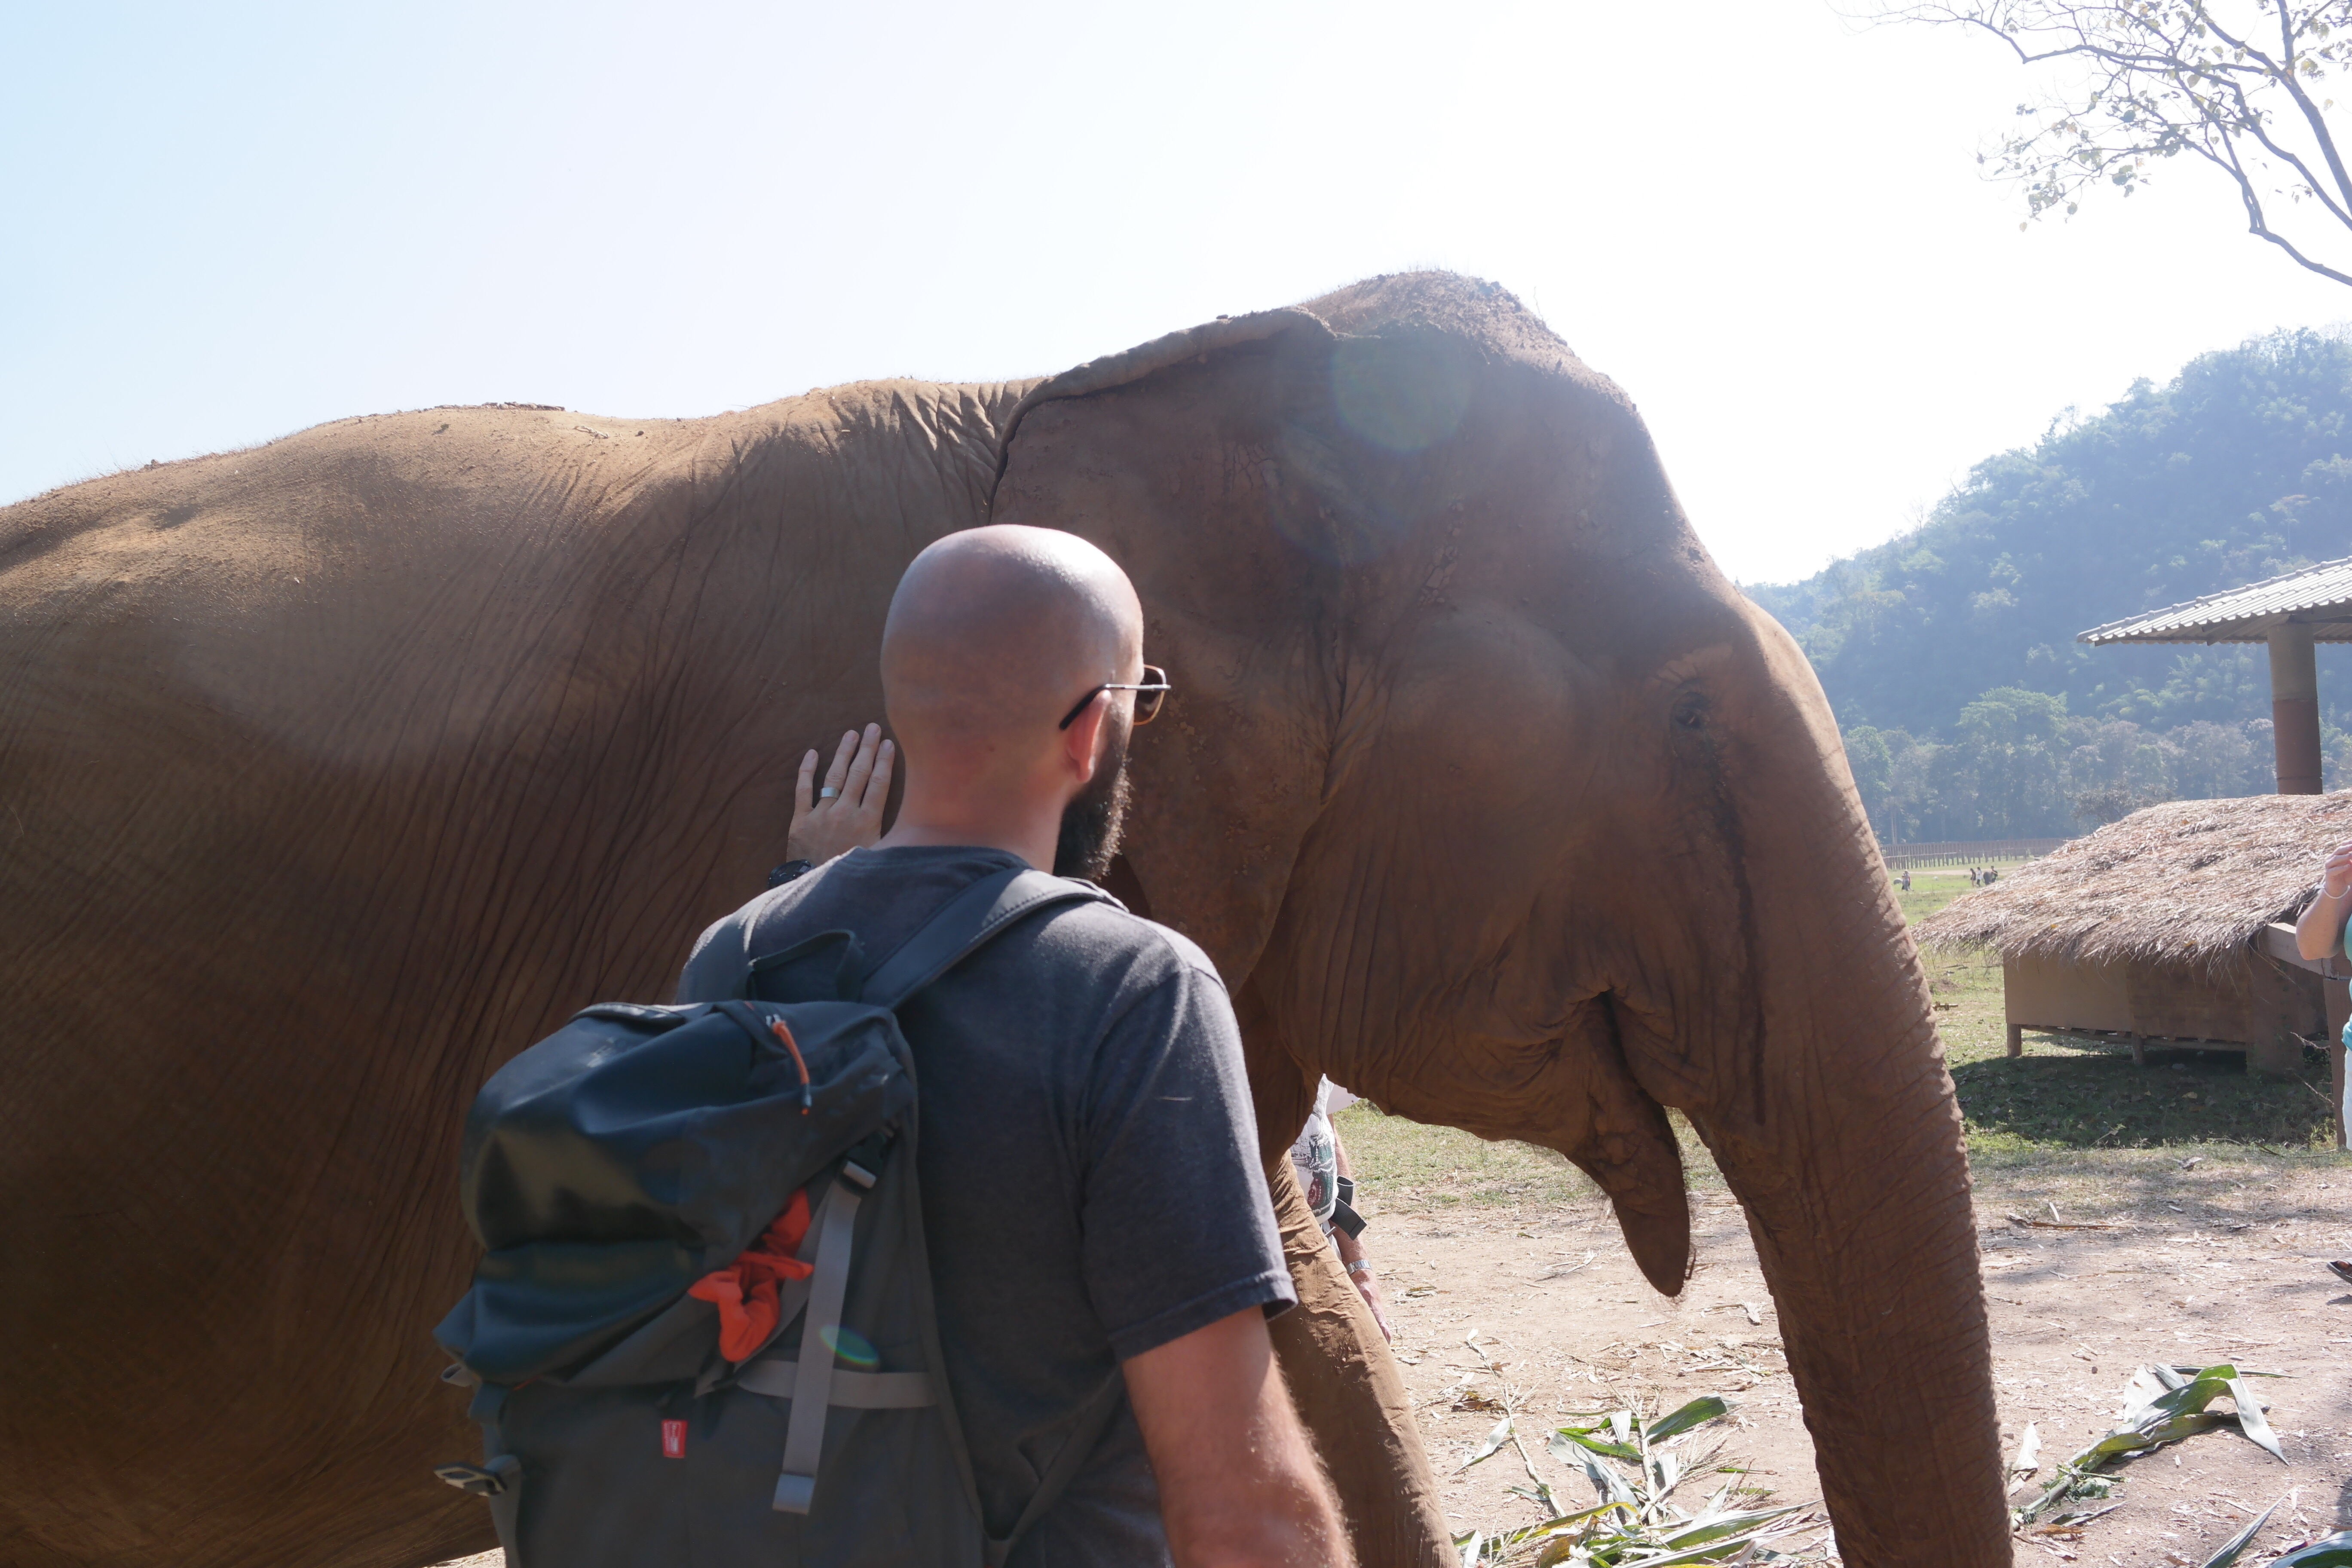 Elephant Nature Park – The Peelander Project